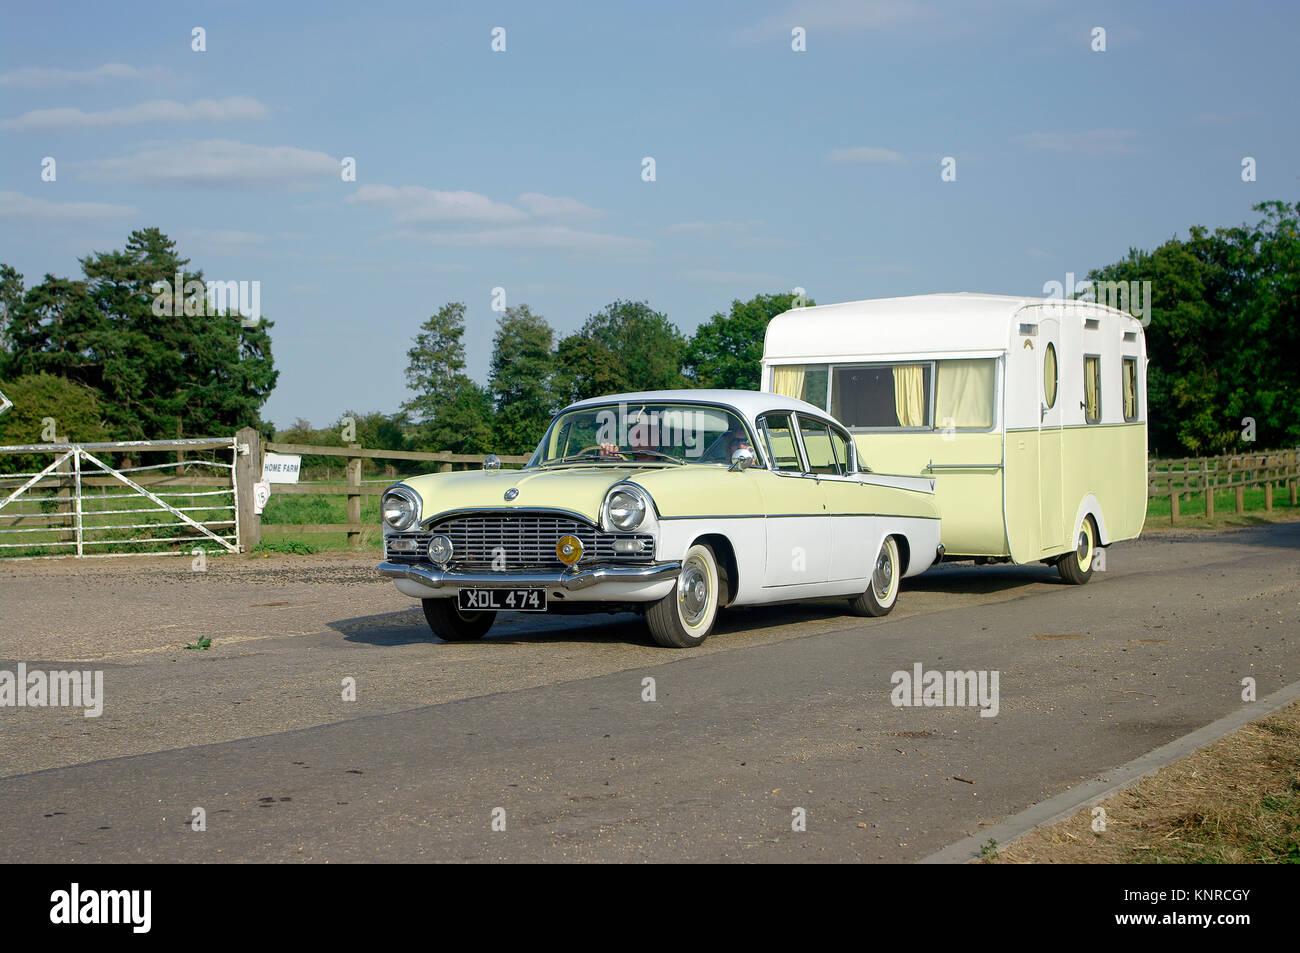 1962 Vauxhall Cresta motor car with caravan - Stock Image